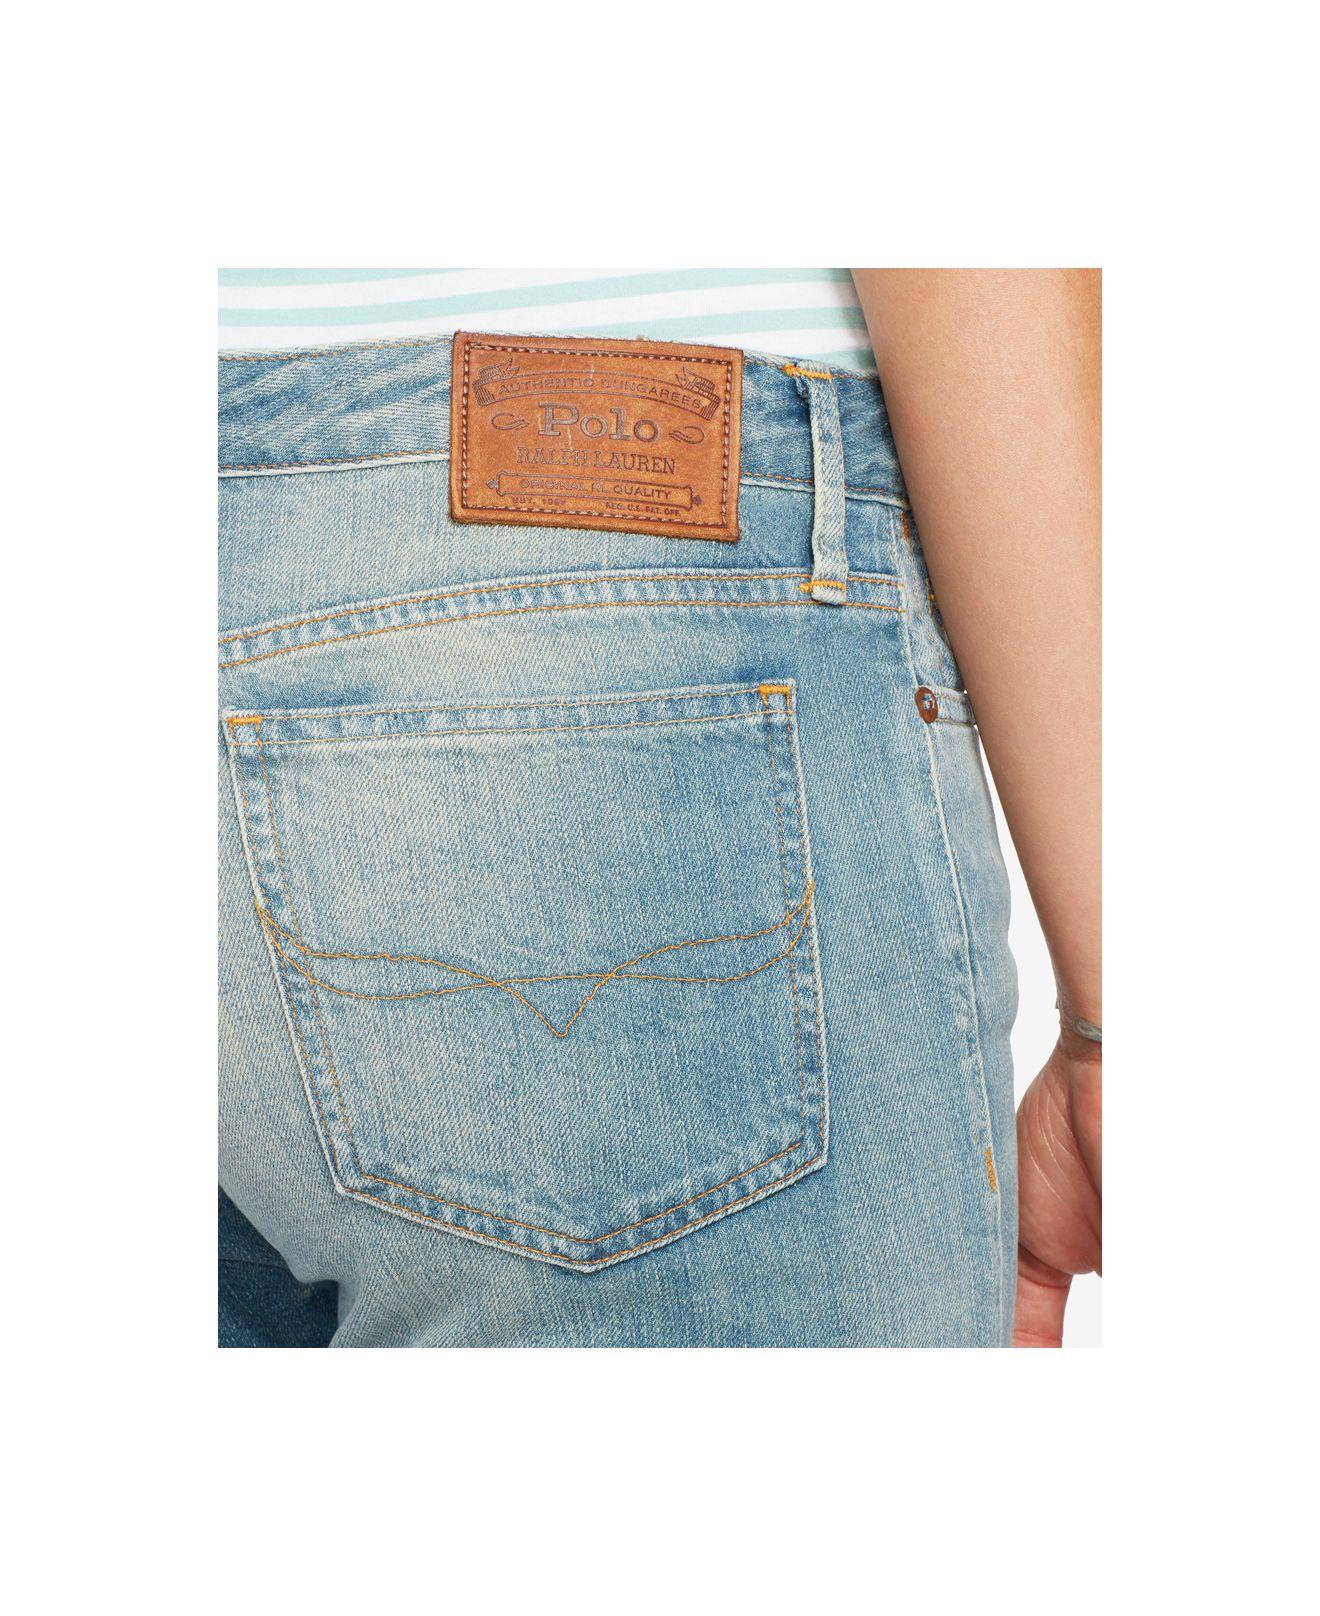 e8d9d00e9 Polo Ralph Lauren Astor Slim Boyfriend Jeans in Blue - Lyst